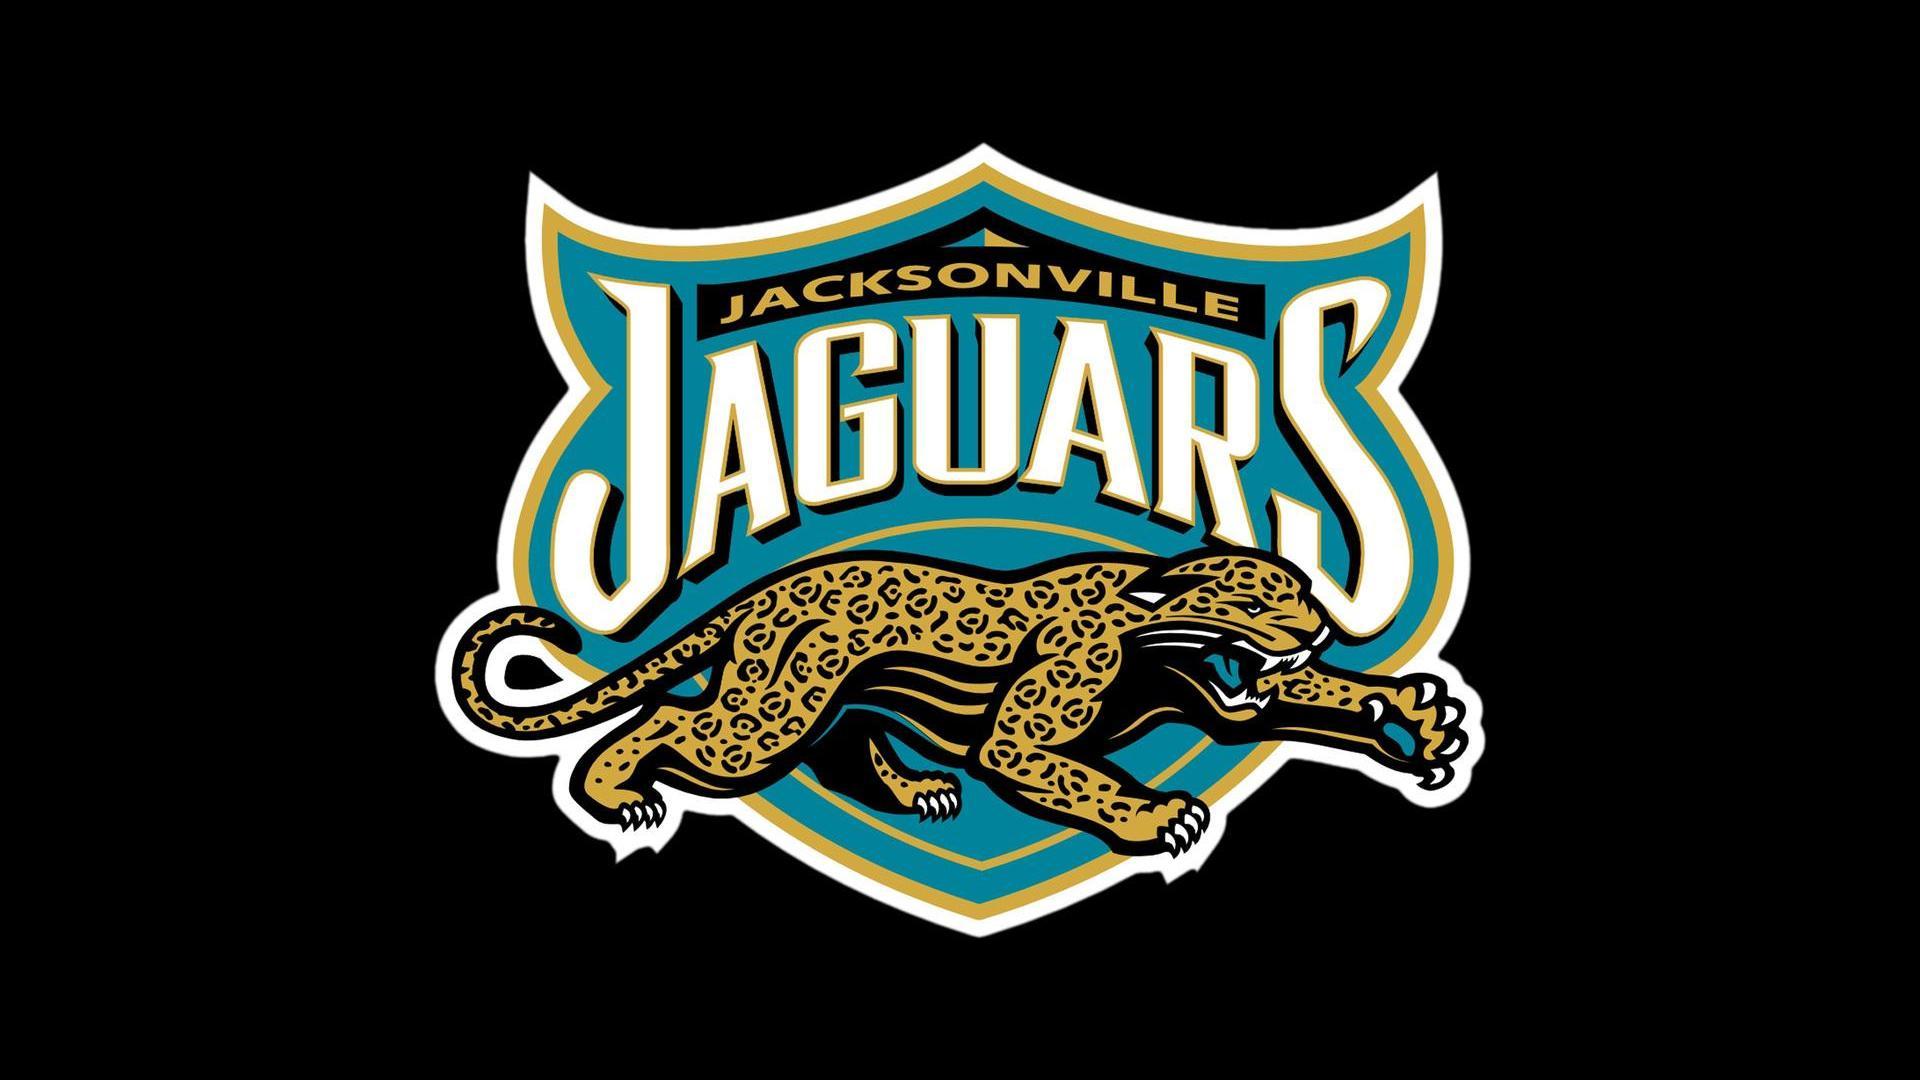 jacksonville jaguars 2017 wallpaper - photo #18